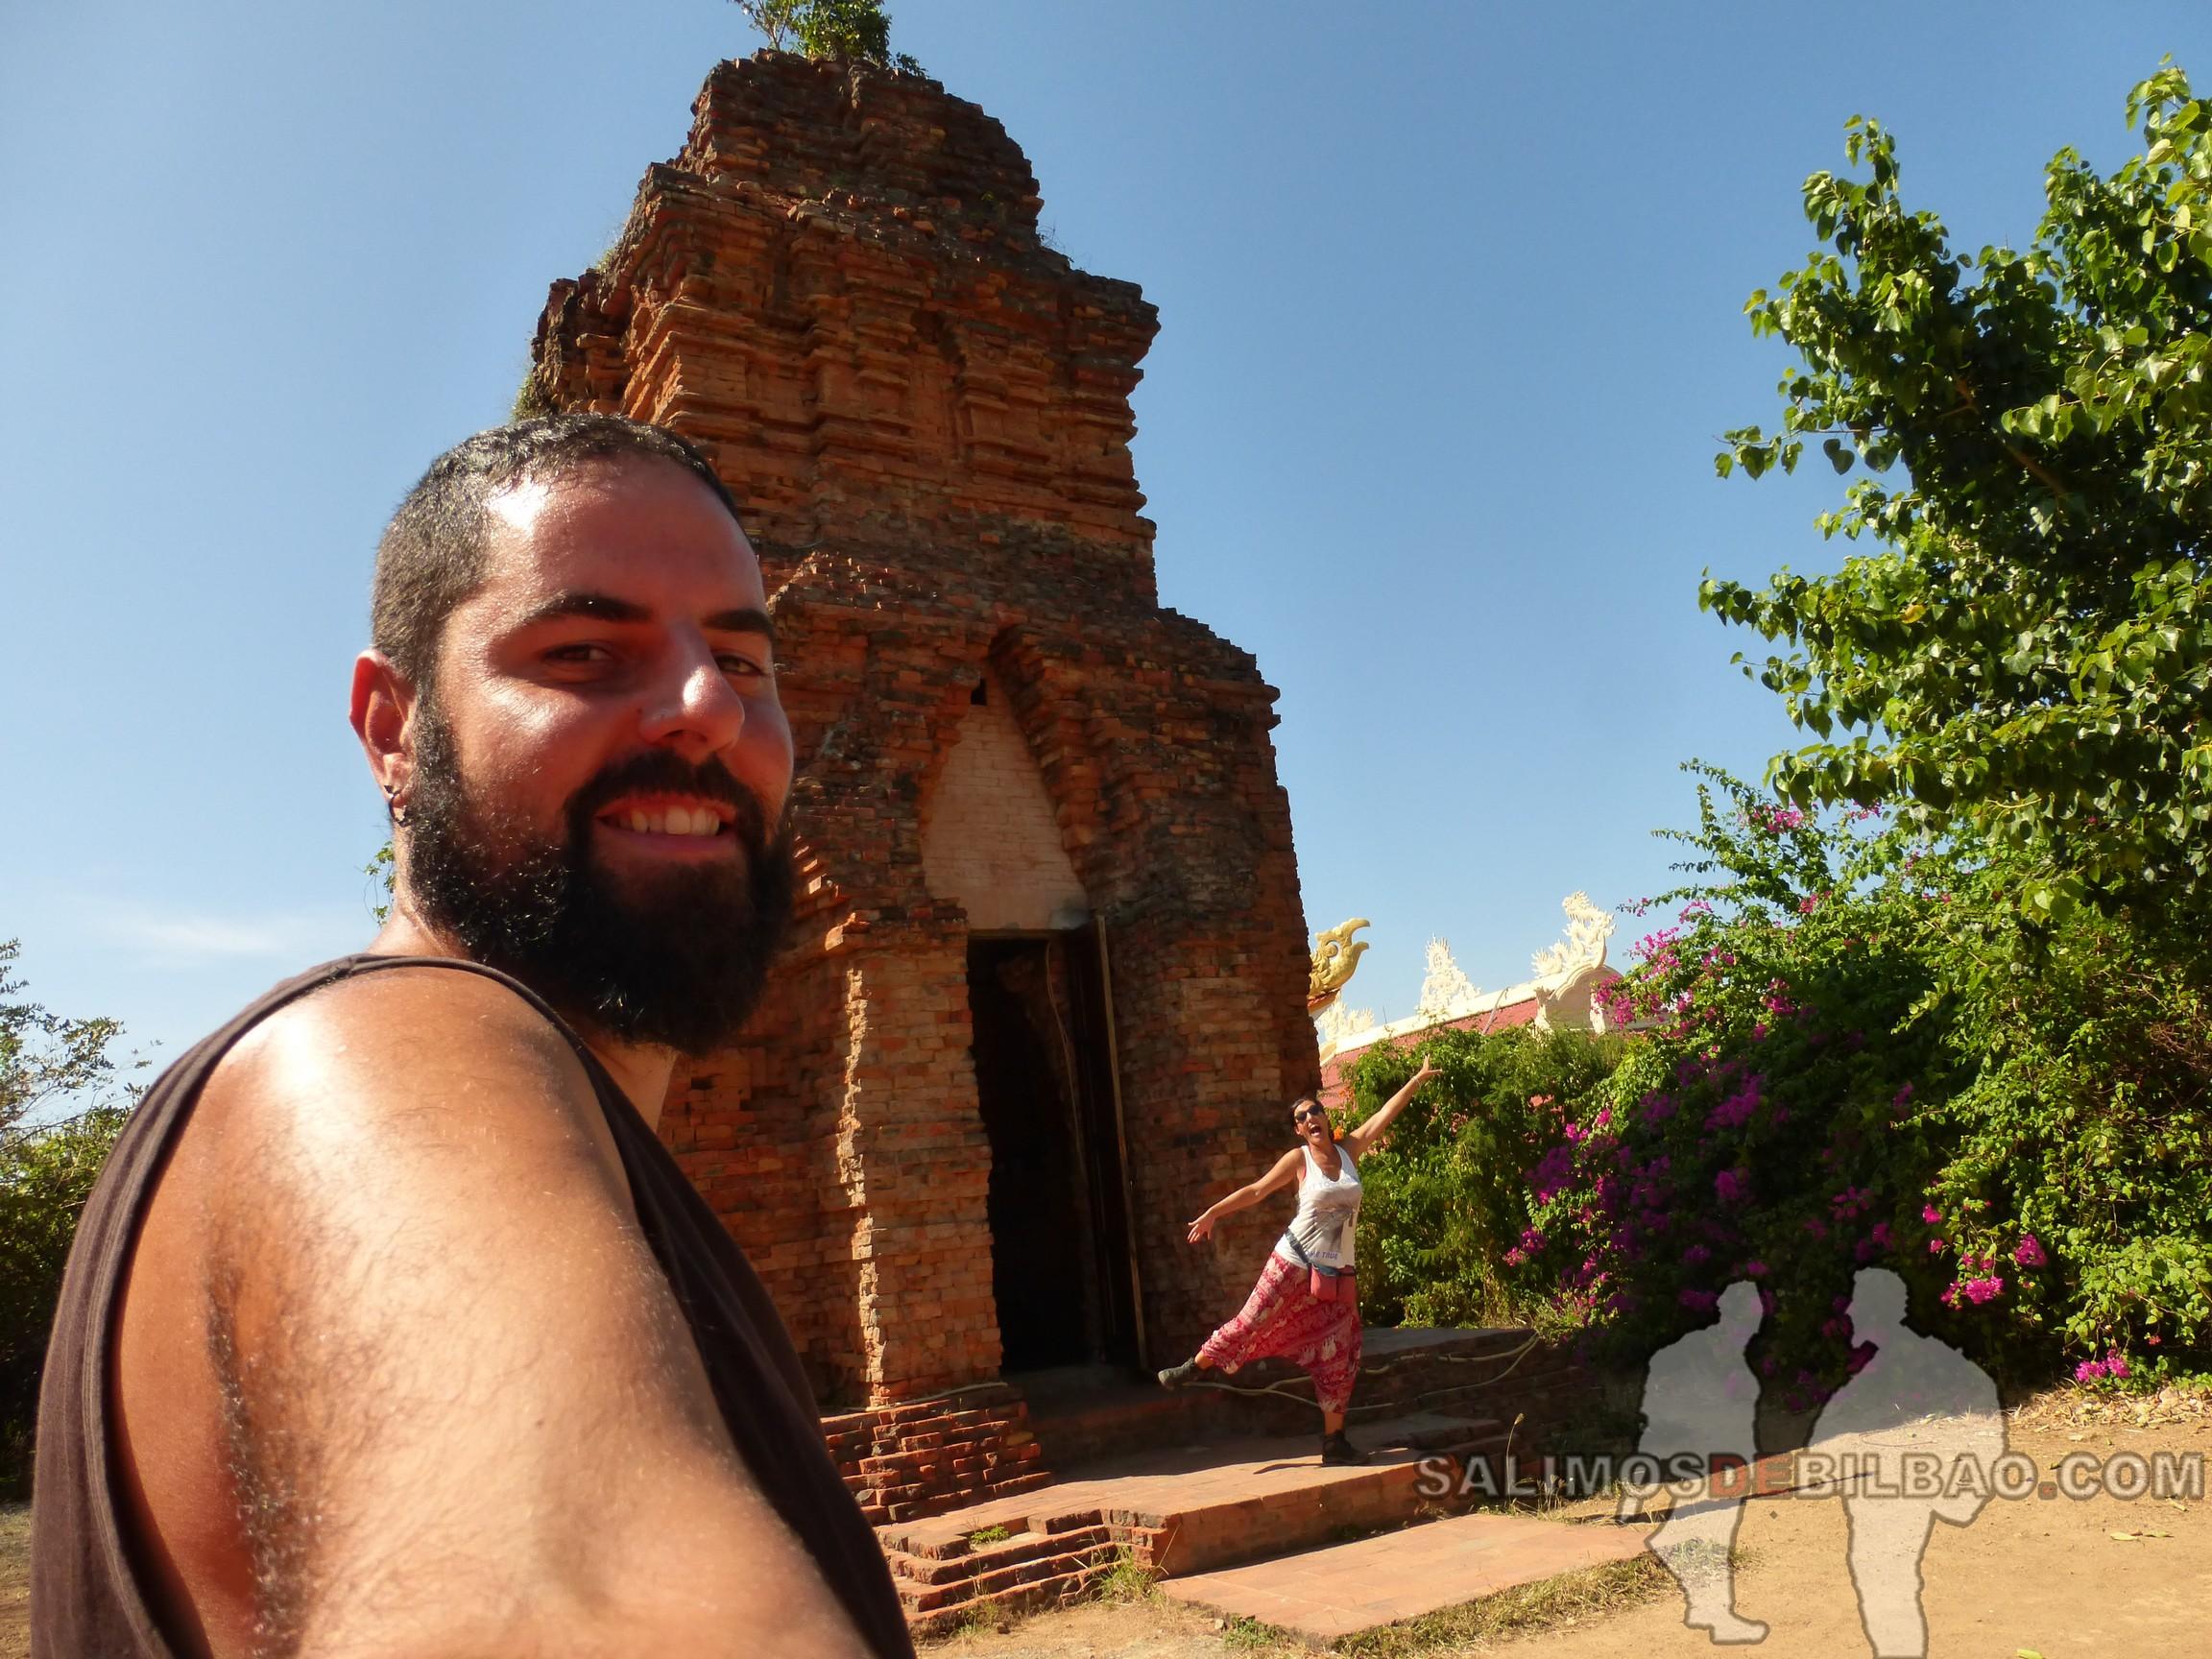 1300. Katz y Saioa, Ruinas Po Sah Inu, Phan Thiet